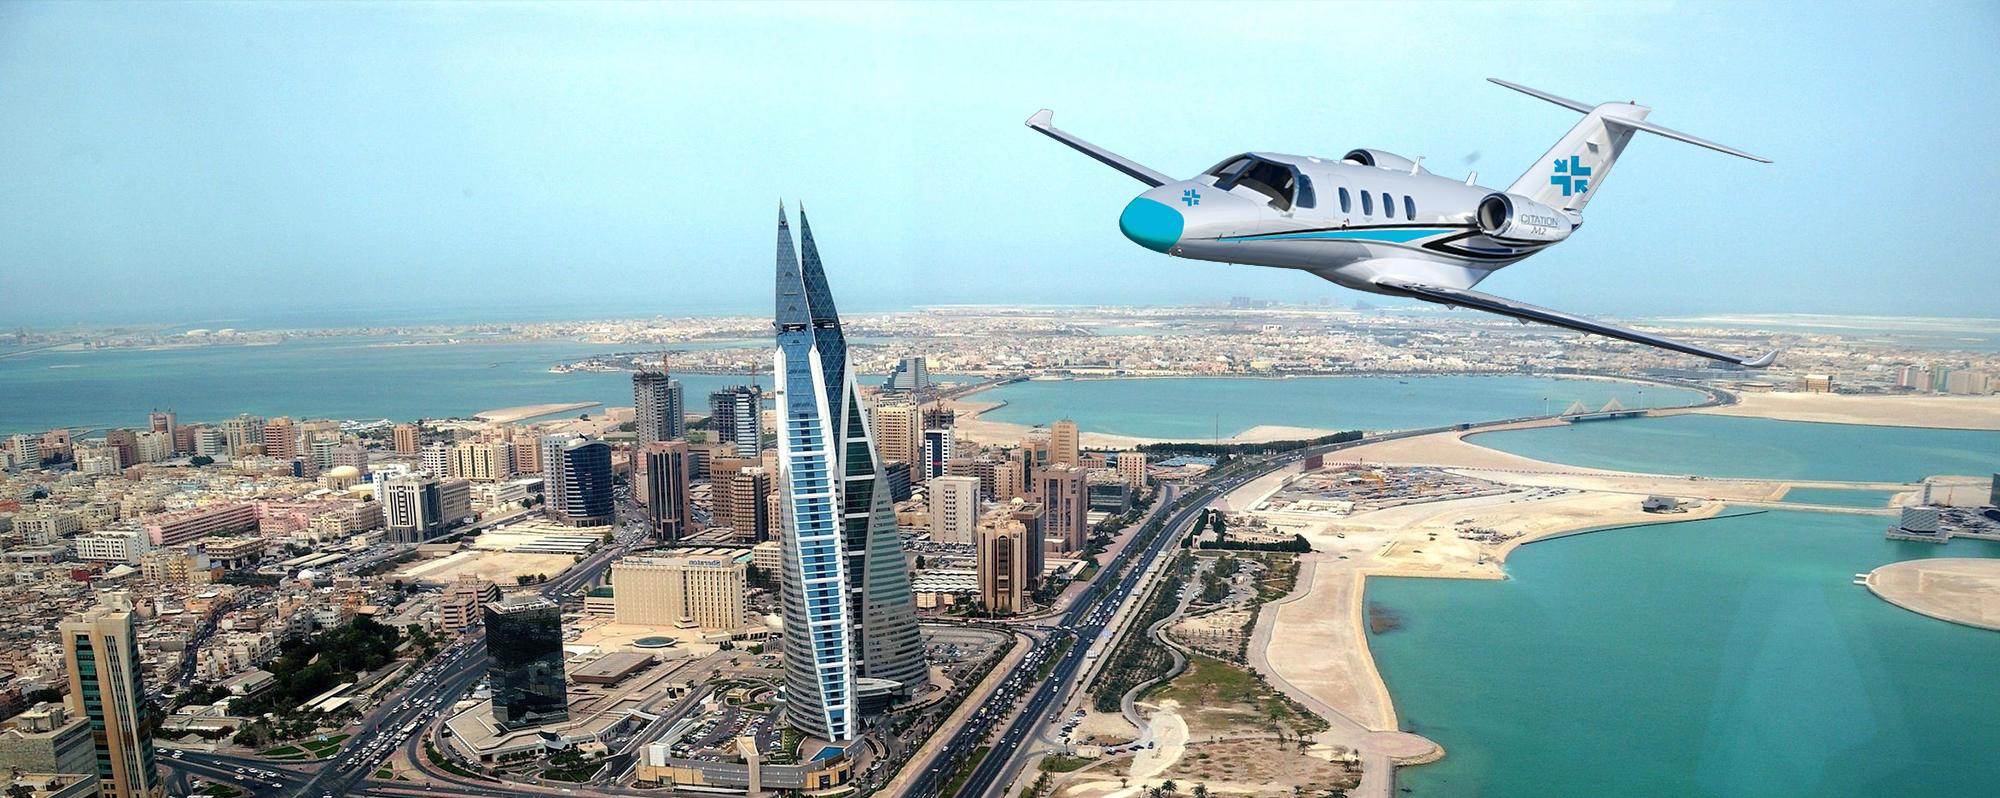 Air Ambulance Bahrain